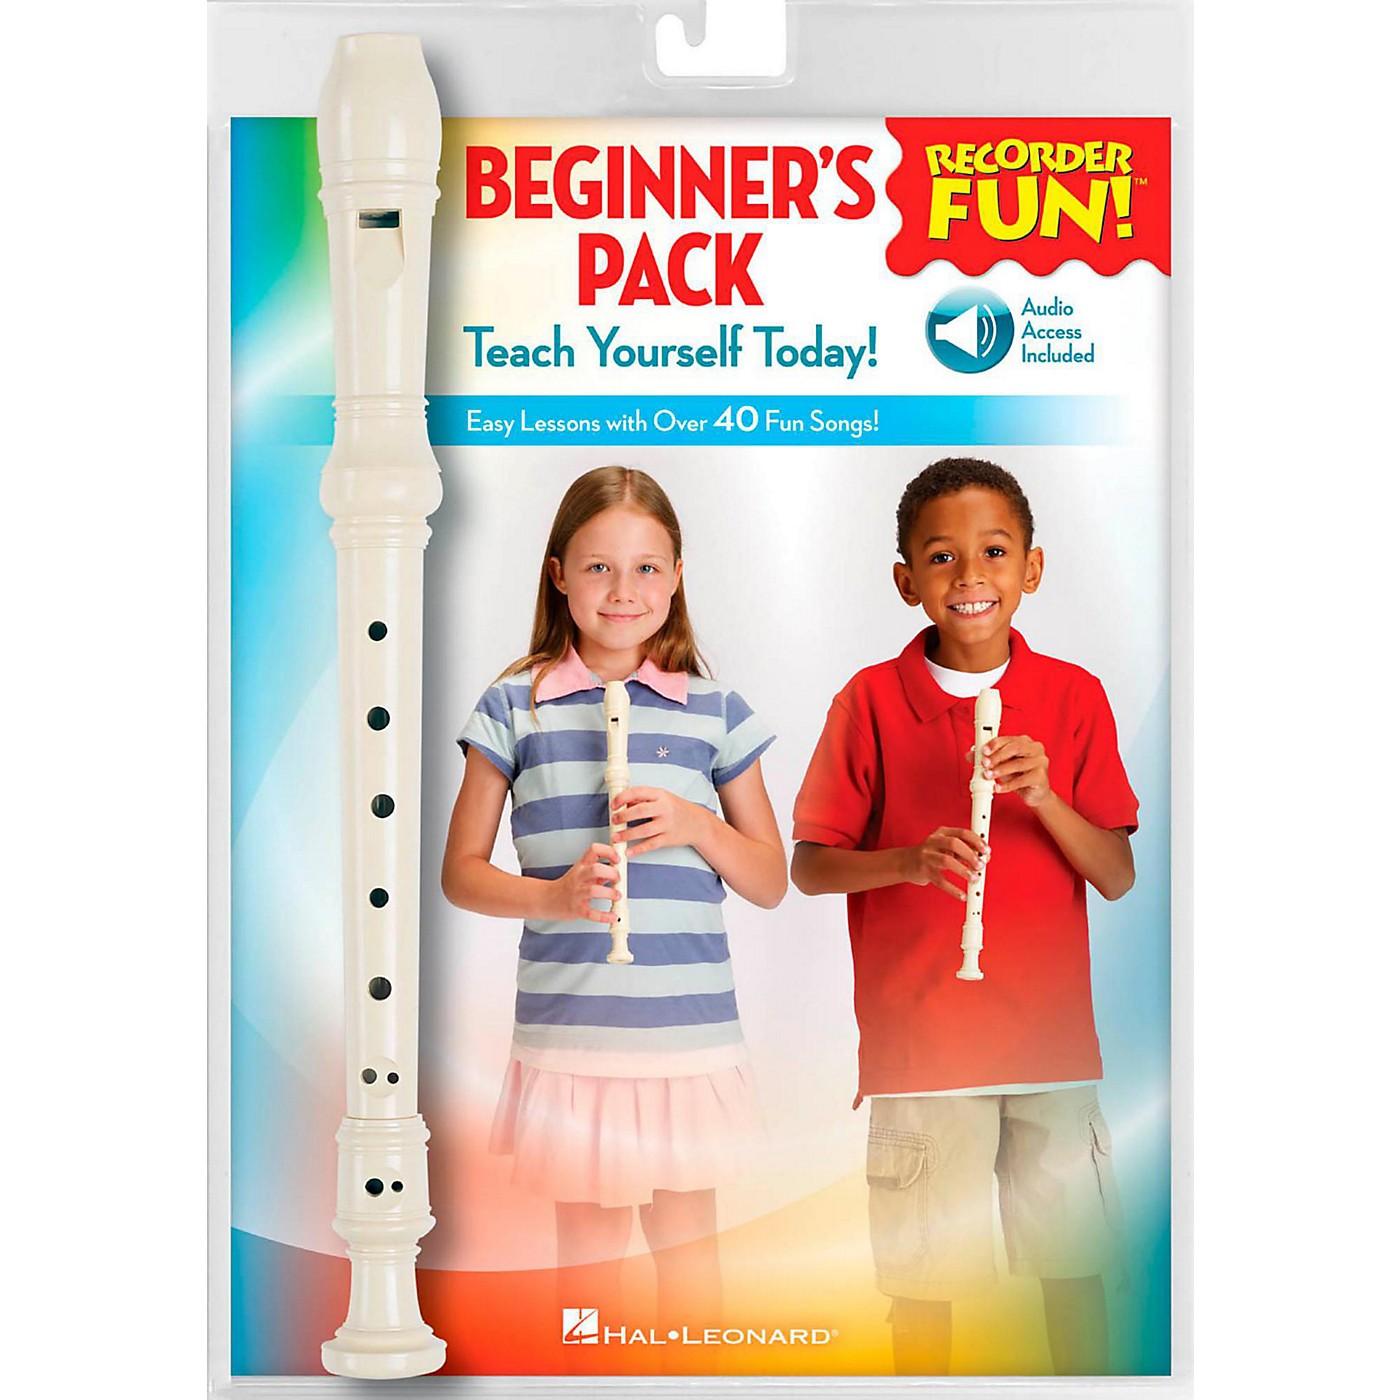 Hal Leonard Recorder Fun! Beginner's Pack Book/Online Audio/Instrument thumbnail